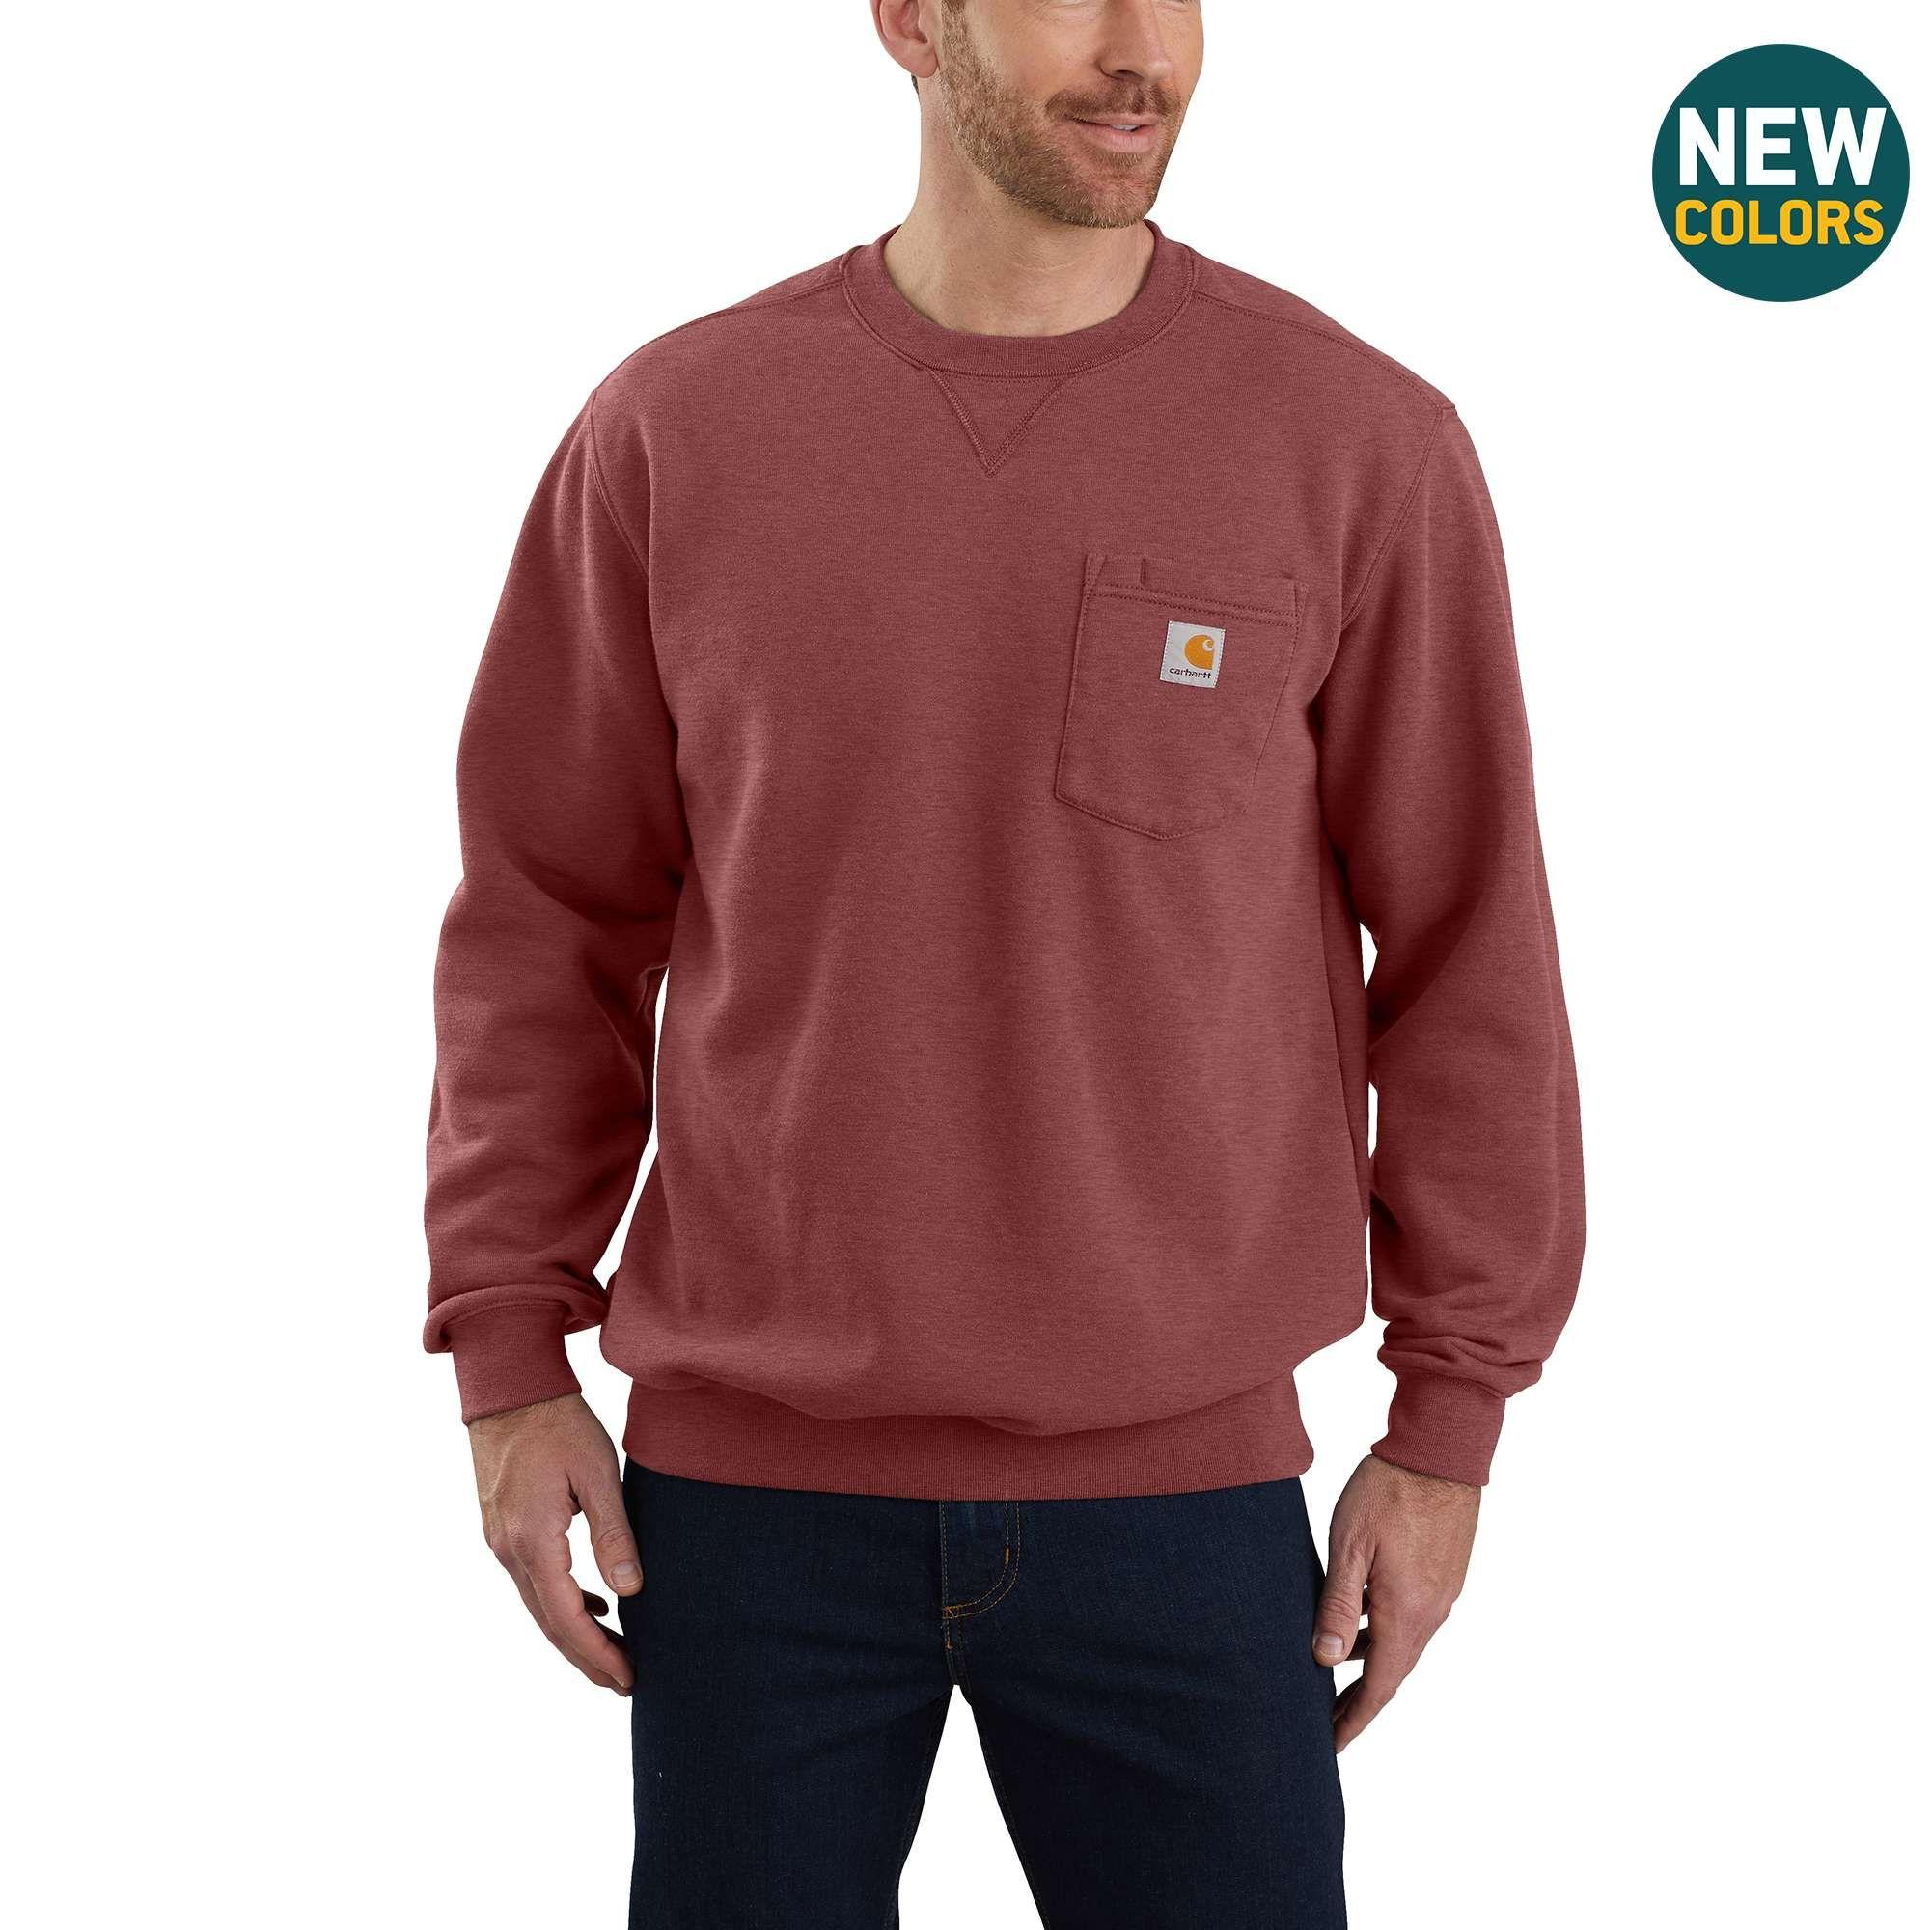 Crewneck Pocket Sweatshirt Pocket Sweatshirt Mens Crewneck Sweatshirt Long Sleeve Tshirt Men [ 2000 x 2002 Pixel ]